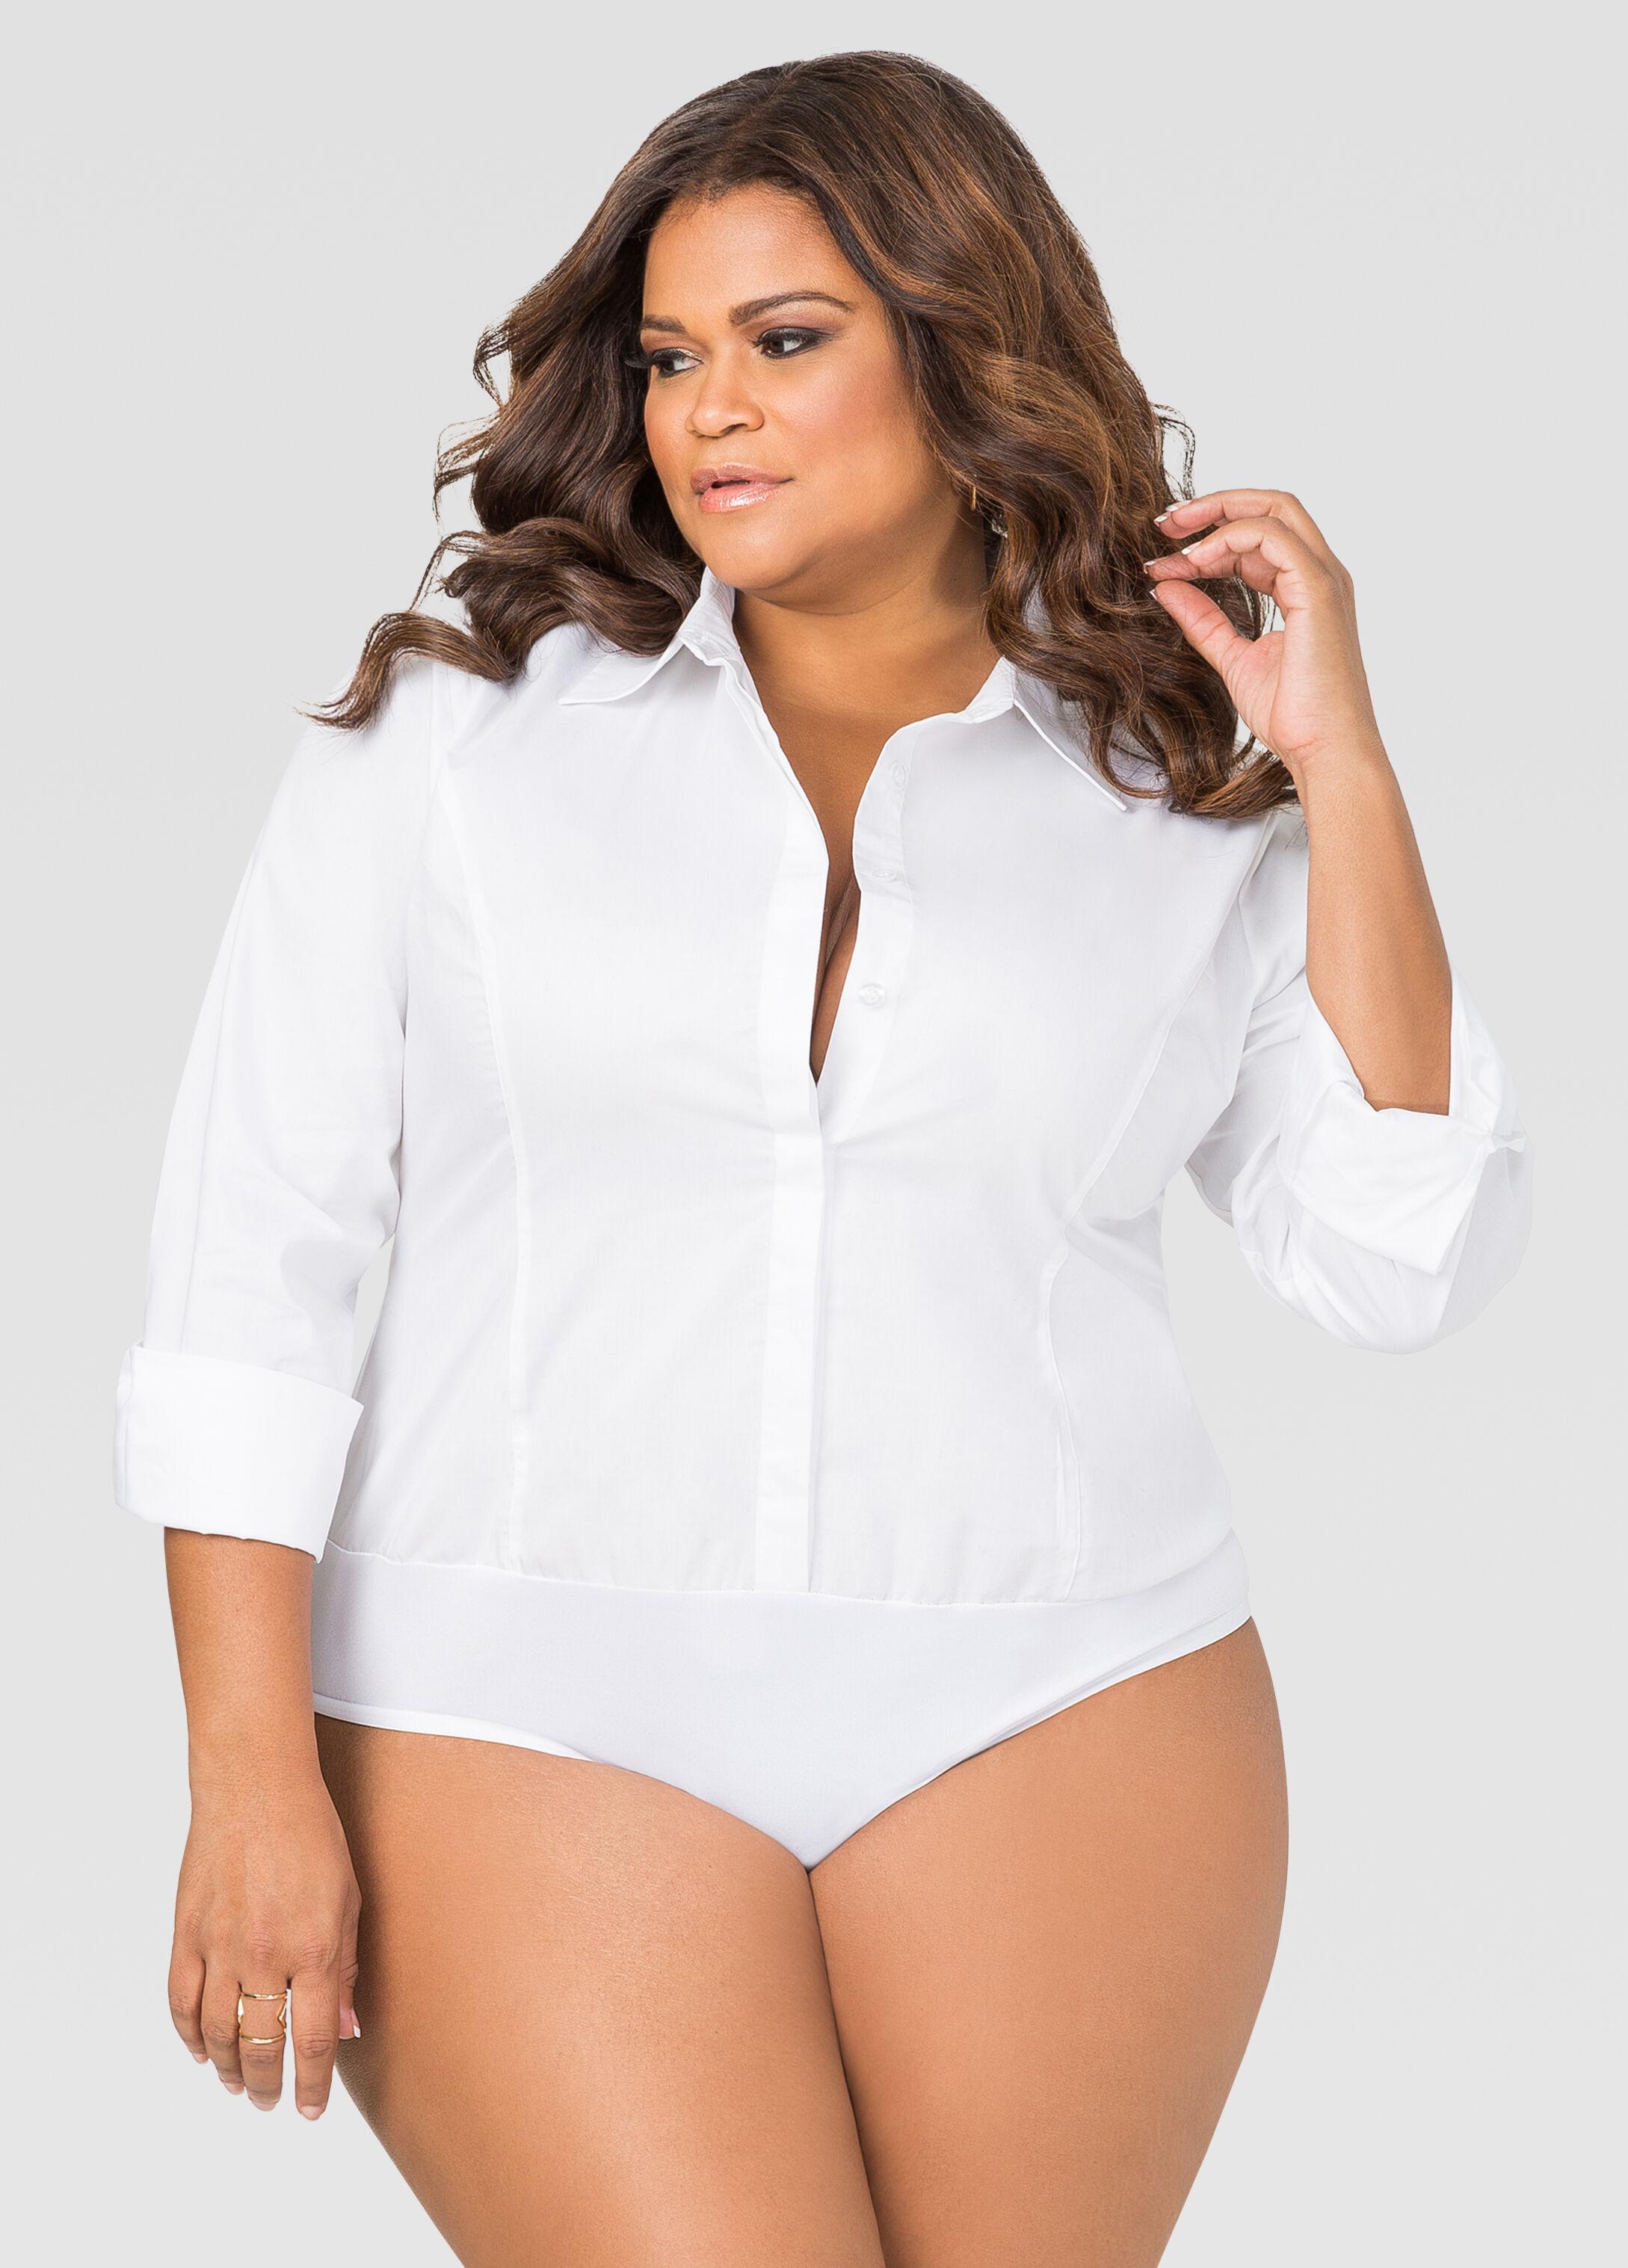 button front shirt bodysuit-plus size bodysuits-ashley stewart-035